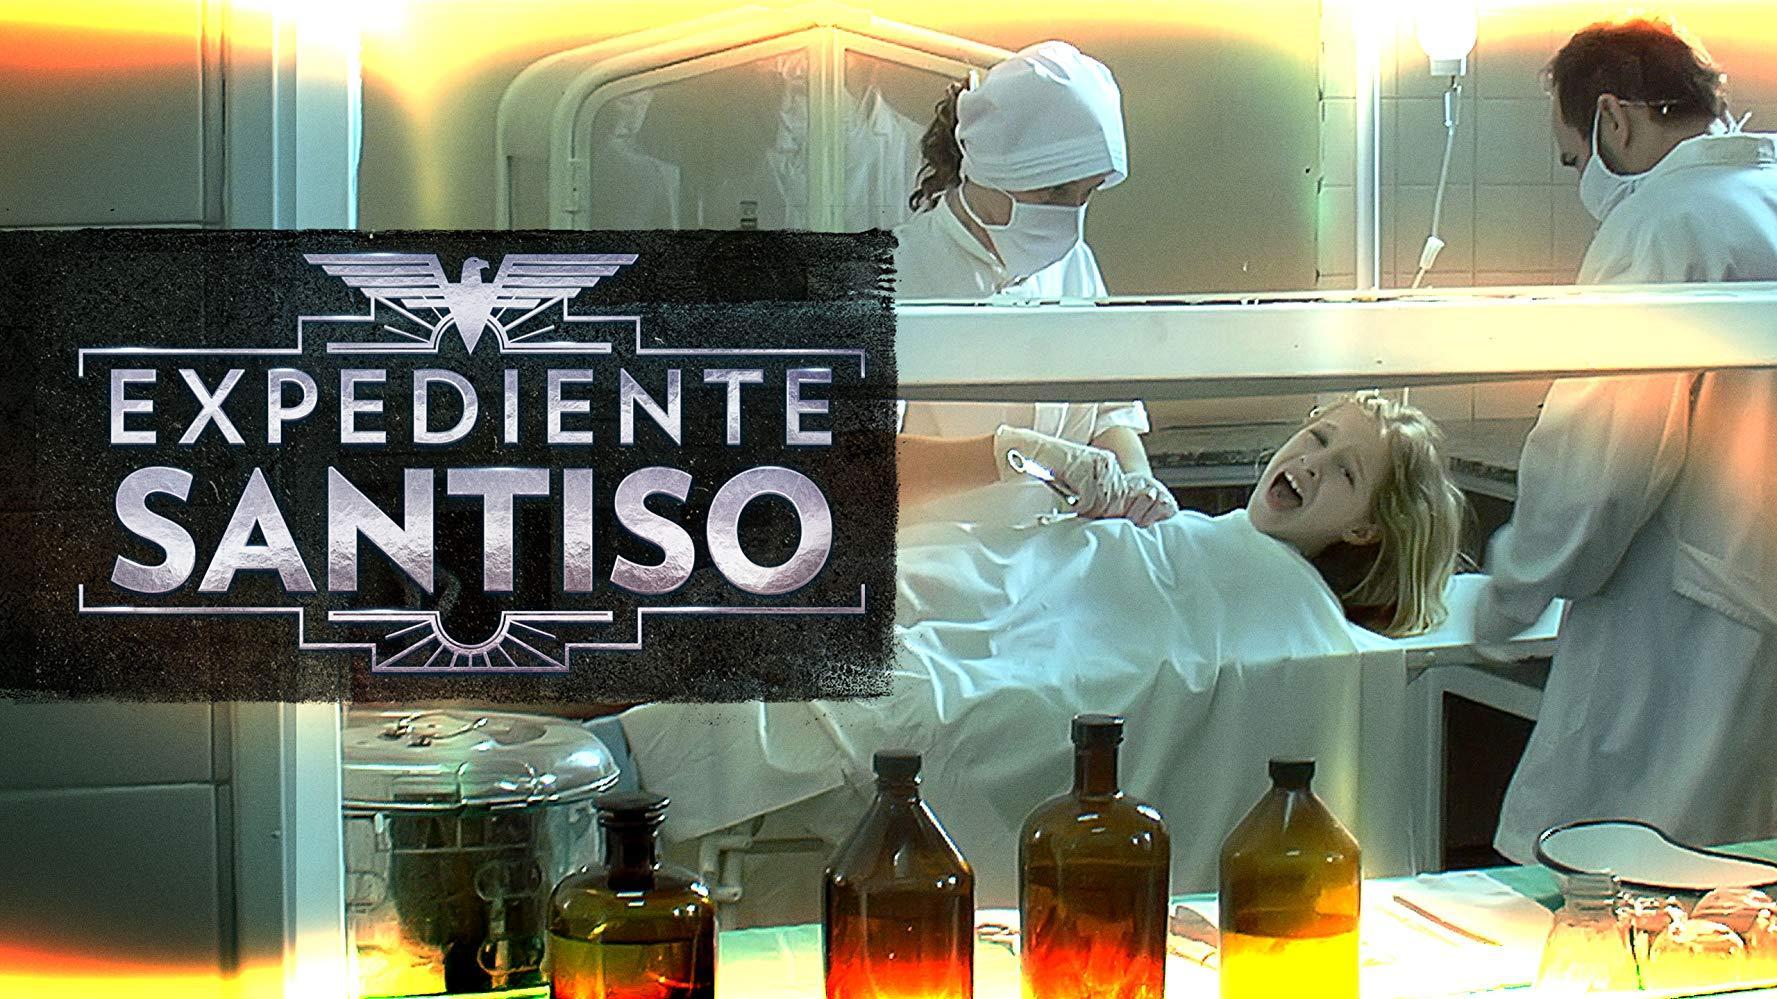 مشاهدة فيلم The Santiso Report 2015 HD مترجم كامل اون لاين